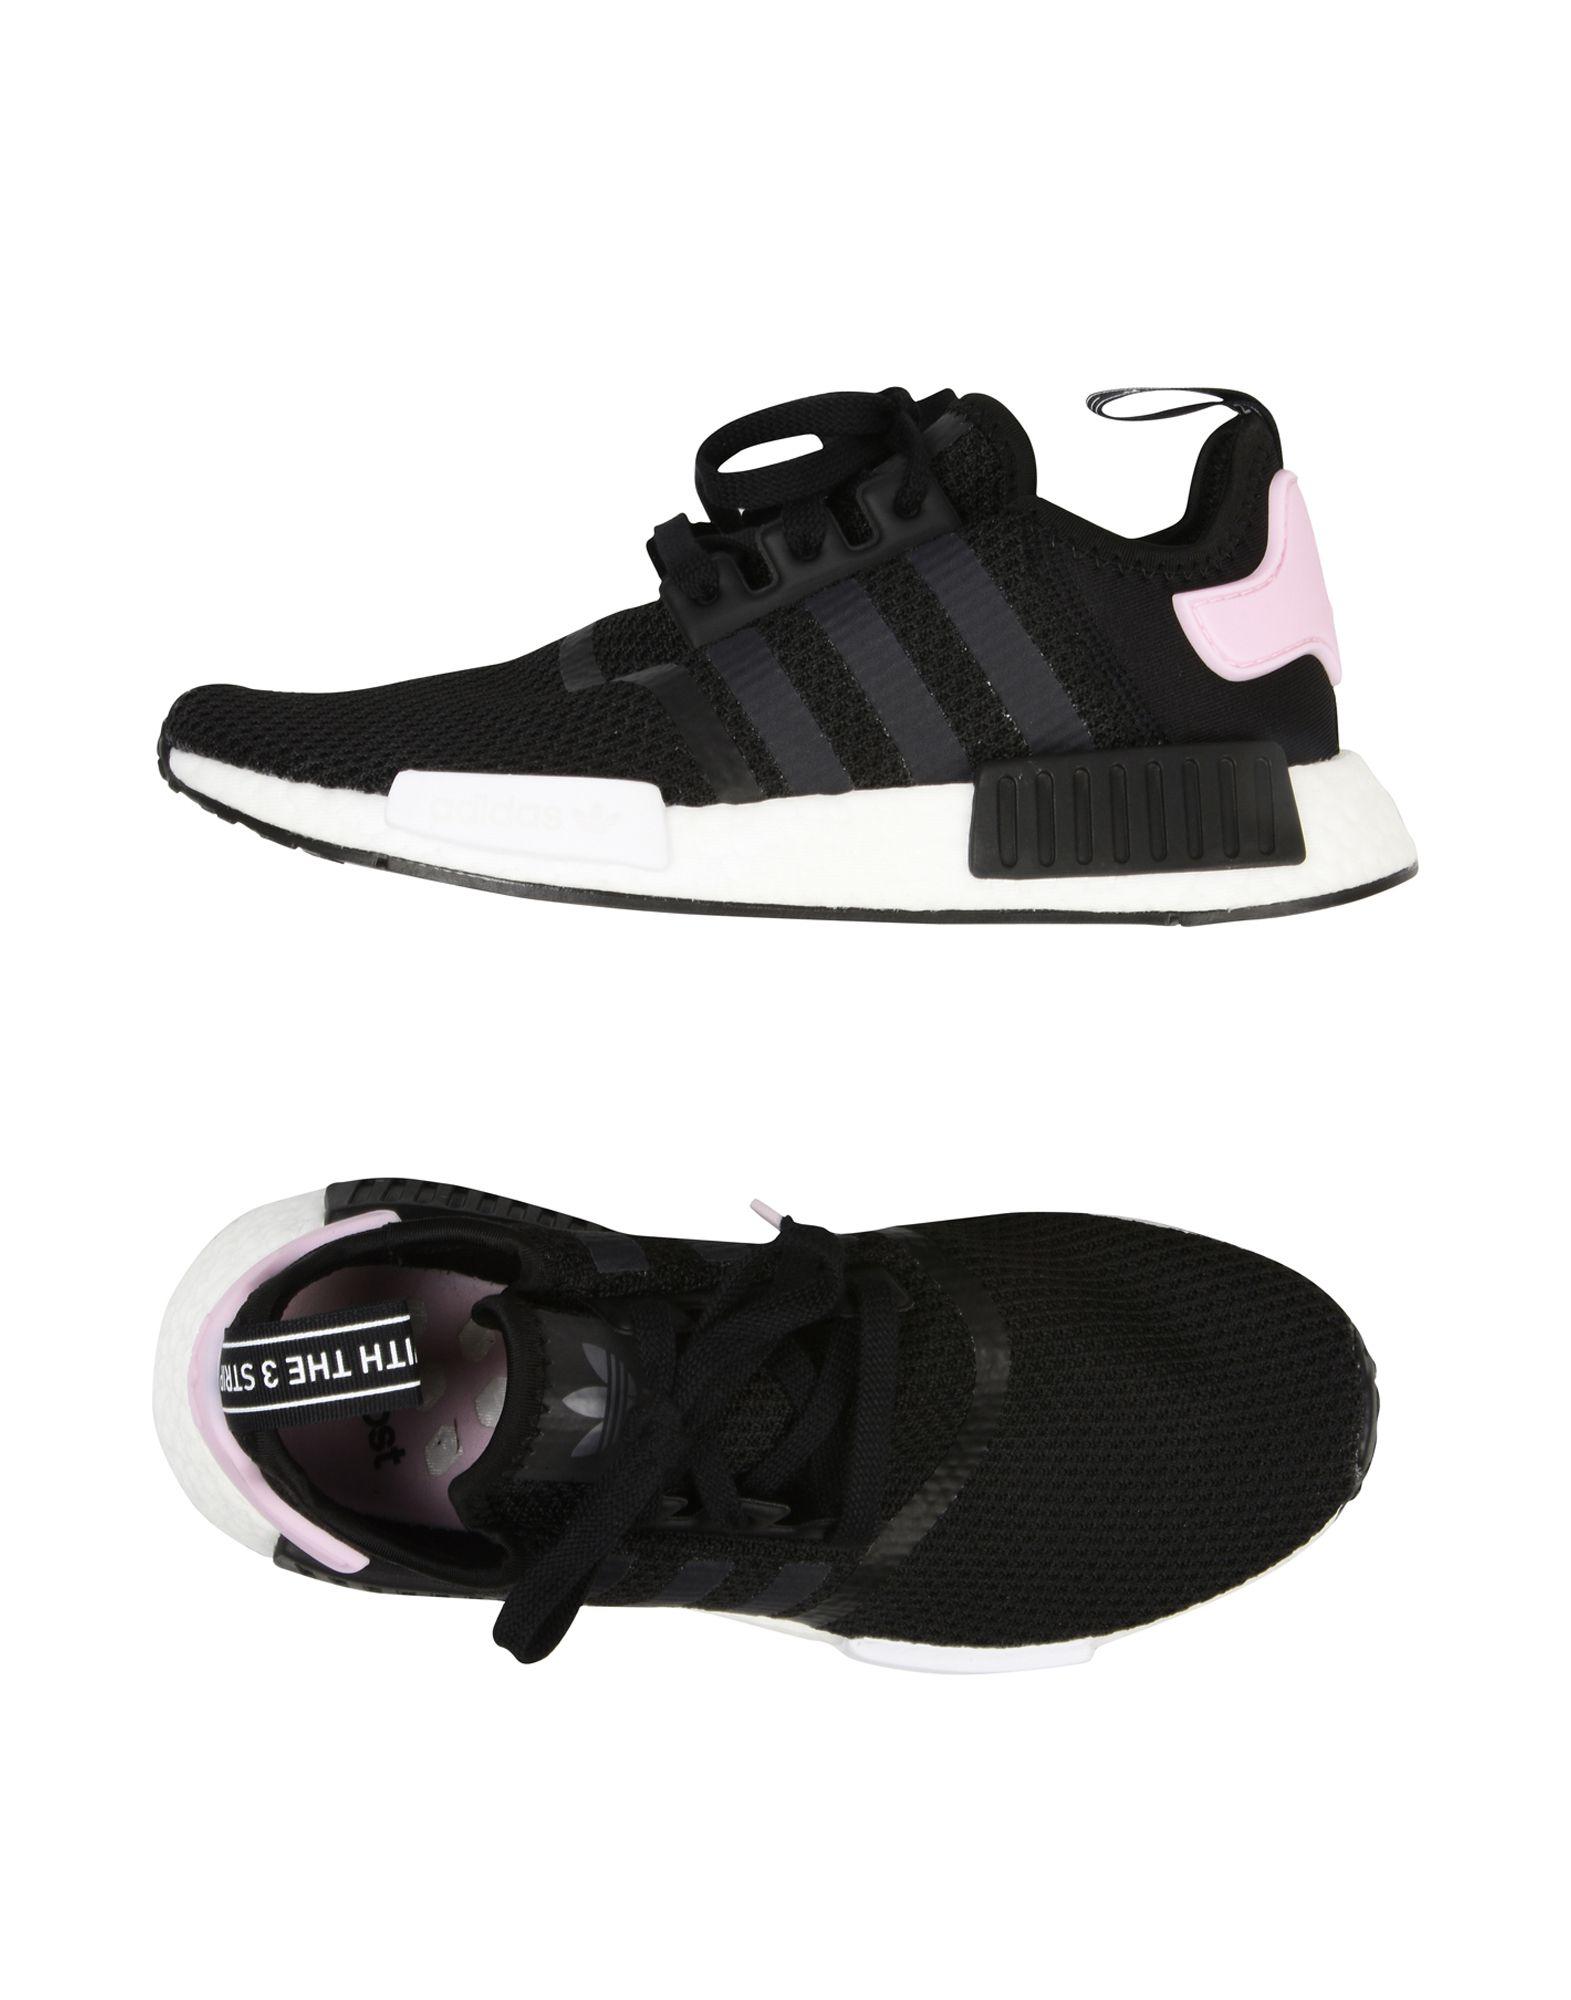 ADIDAS ORIGINALS Низкие кеды и кроссовки adidas originals nmd runner white core black